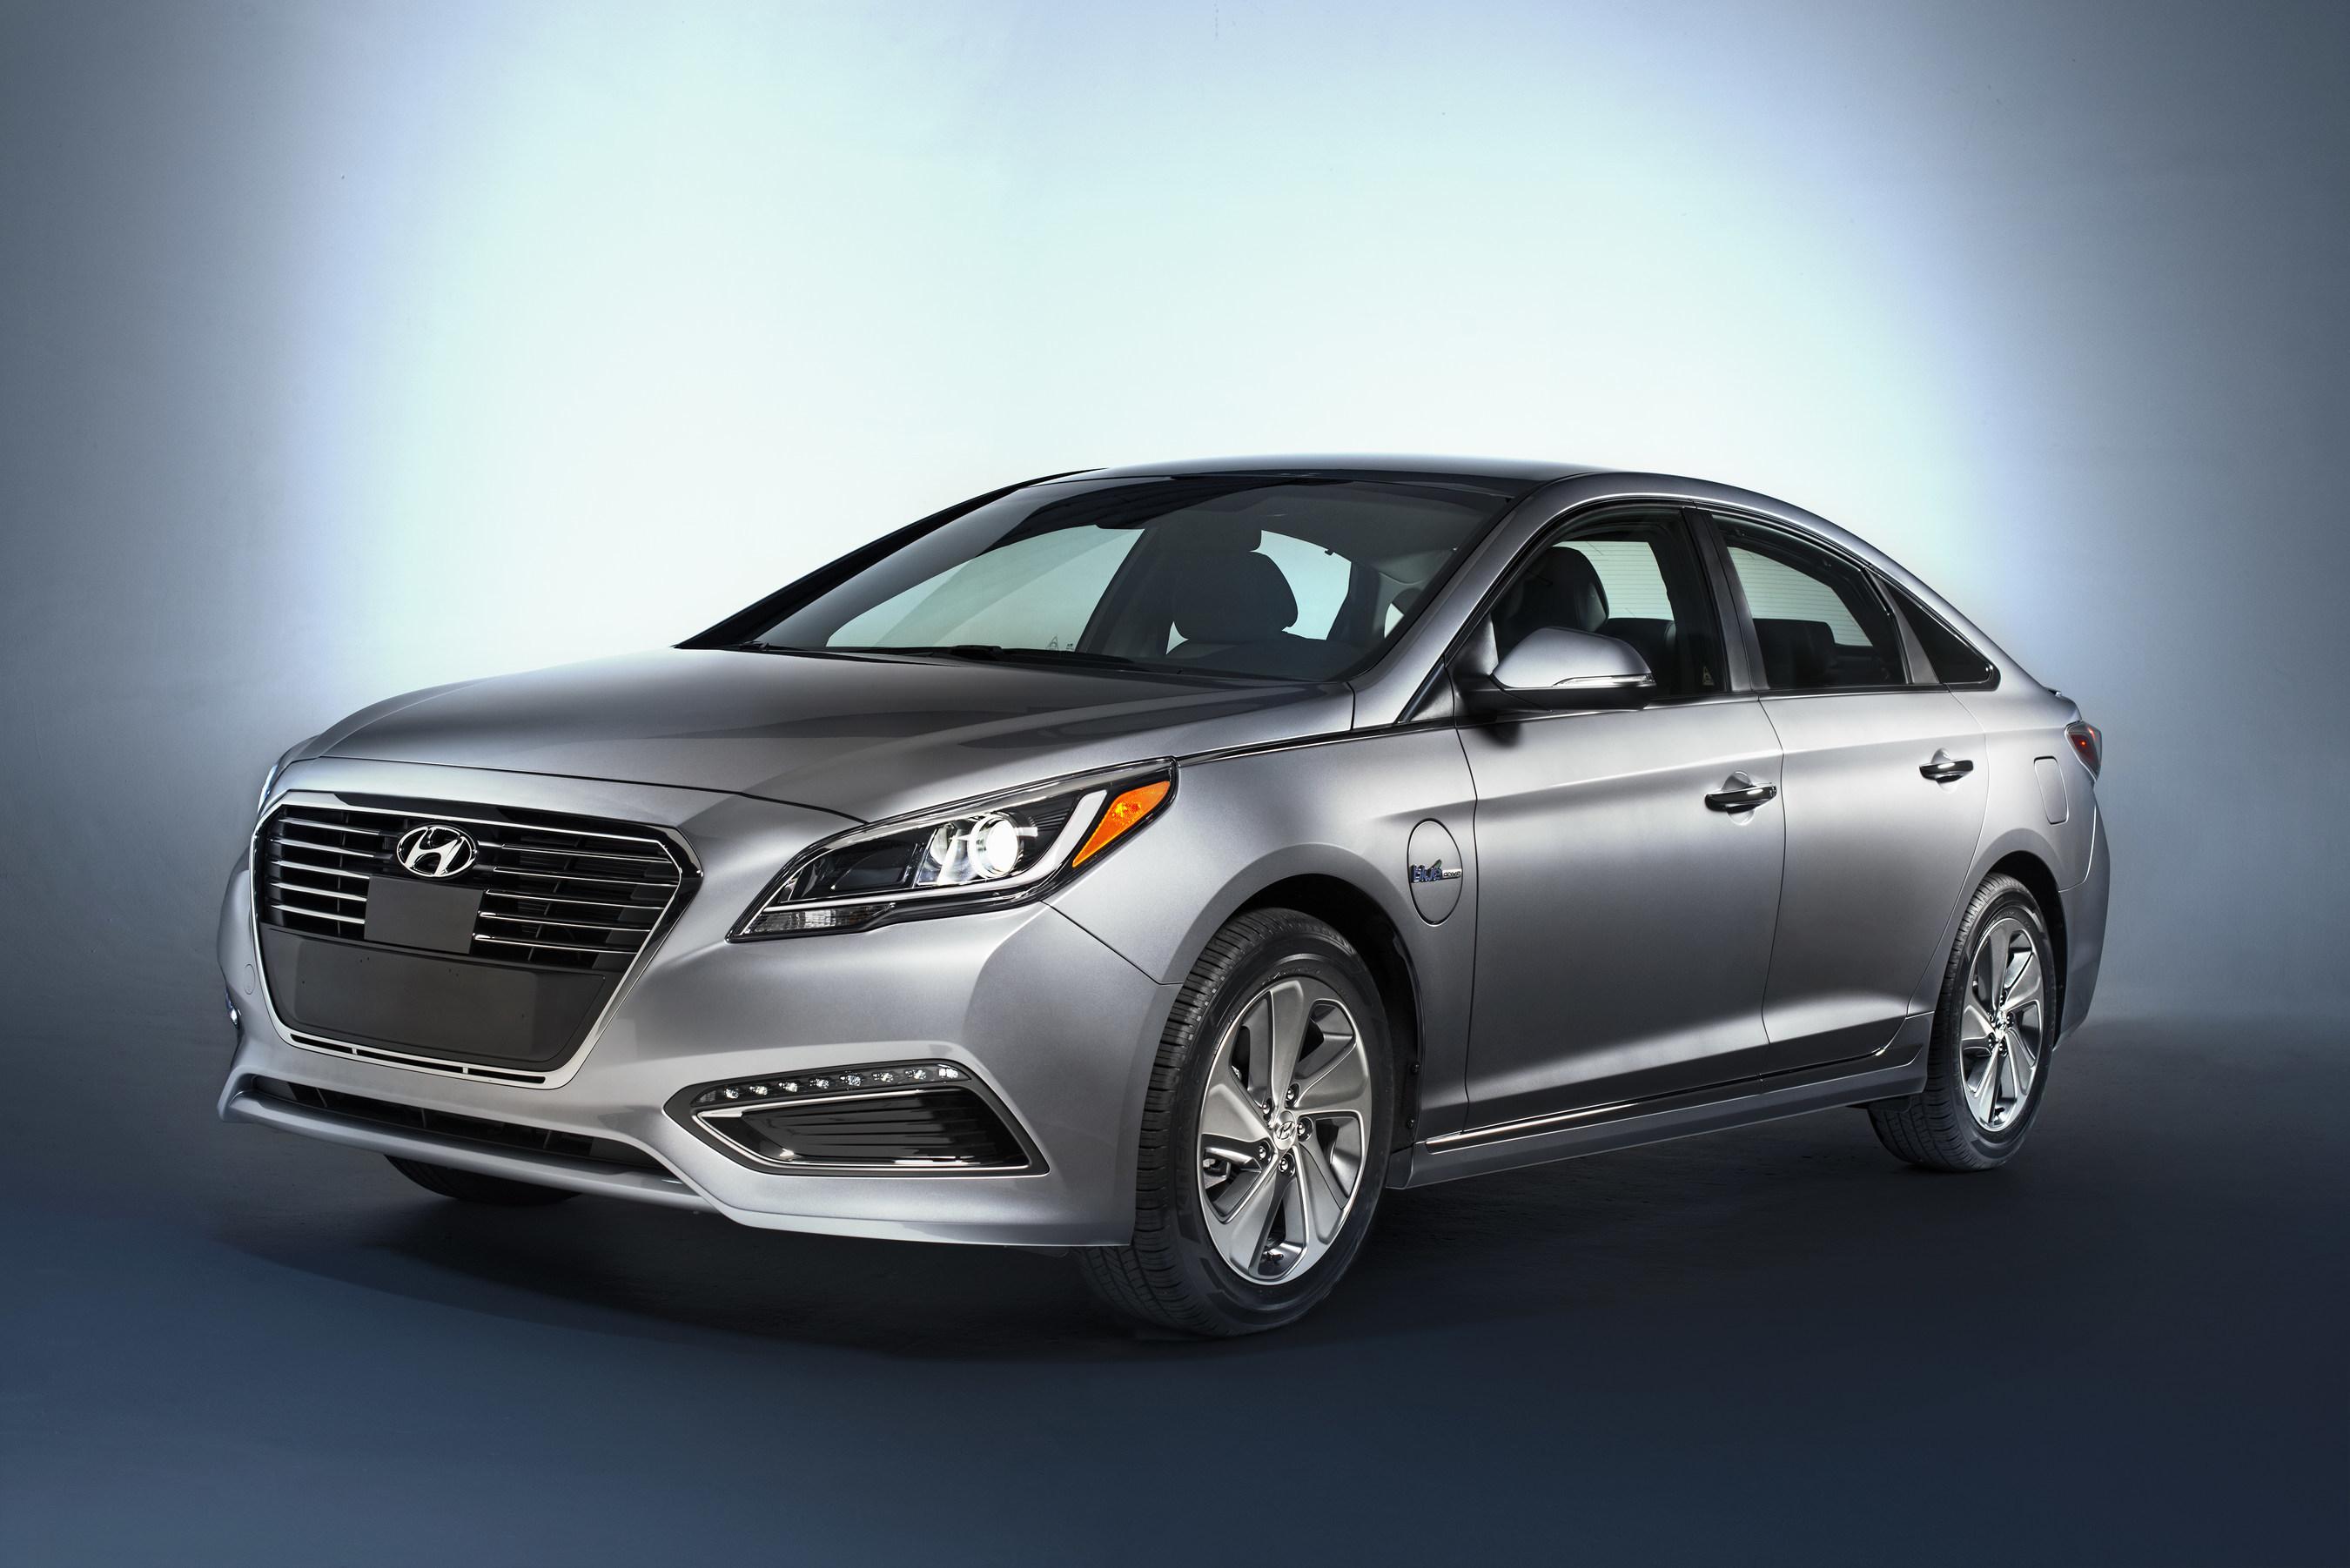 2016 Hyundai Sonata Plug-in Hybrid Delivers Class-Leading 27